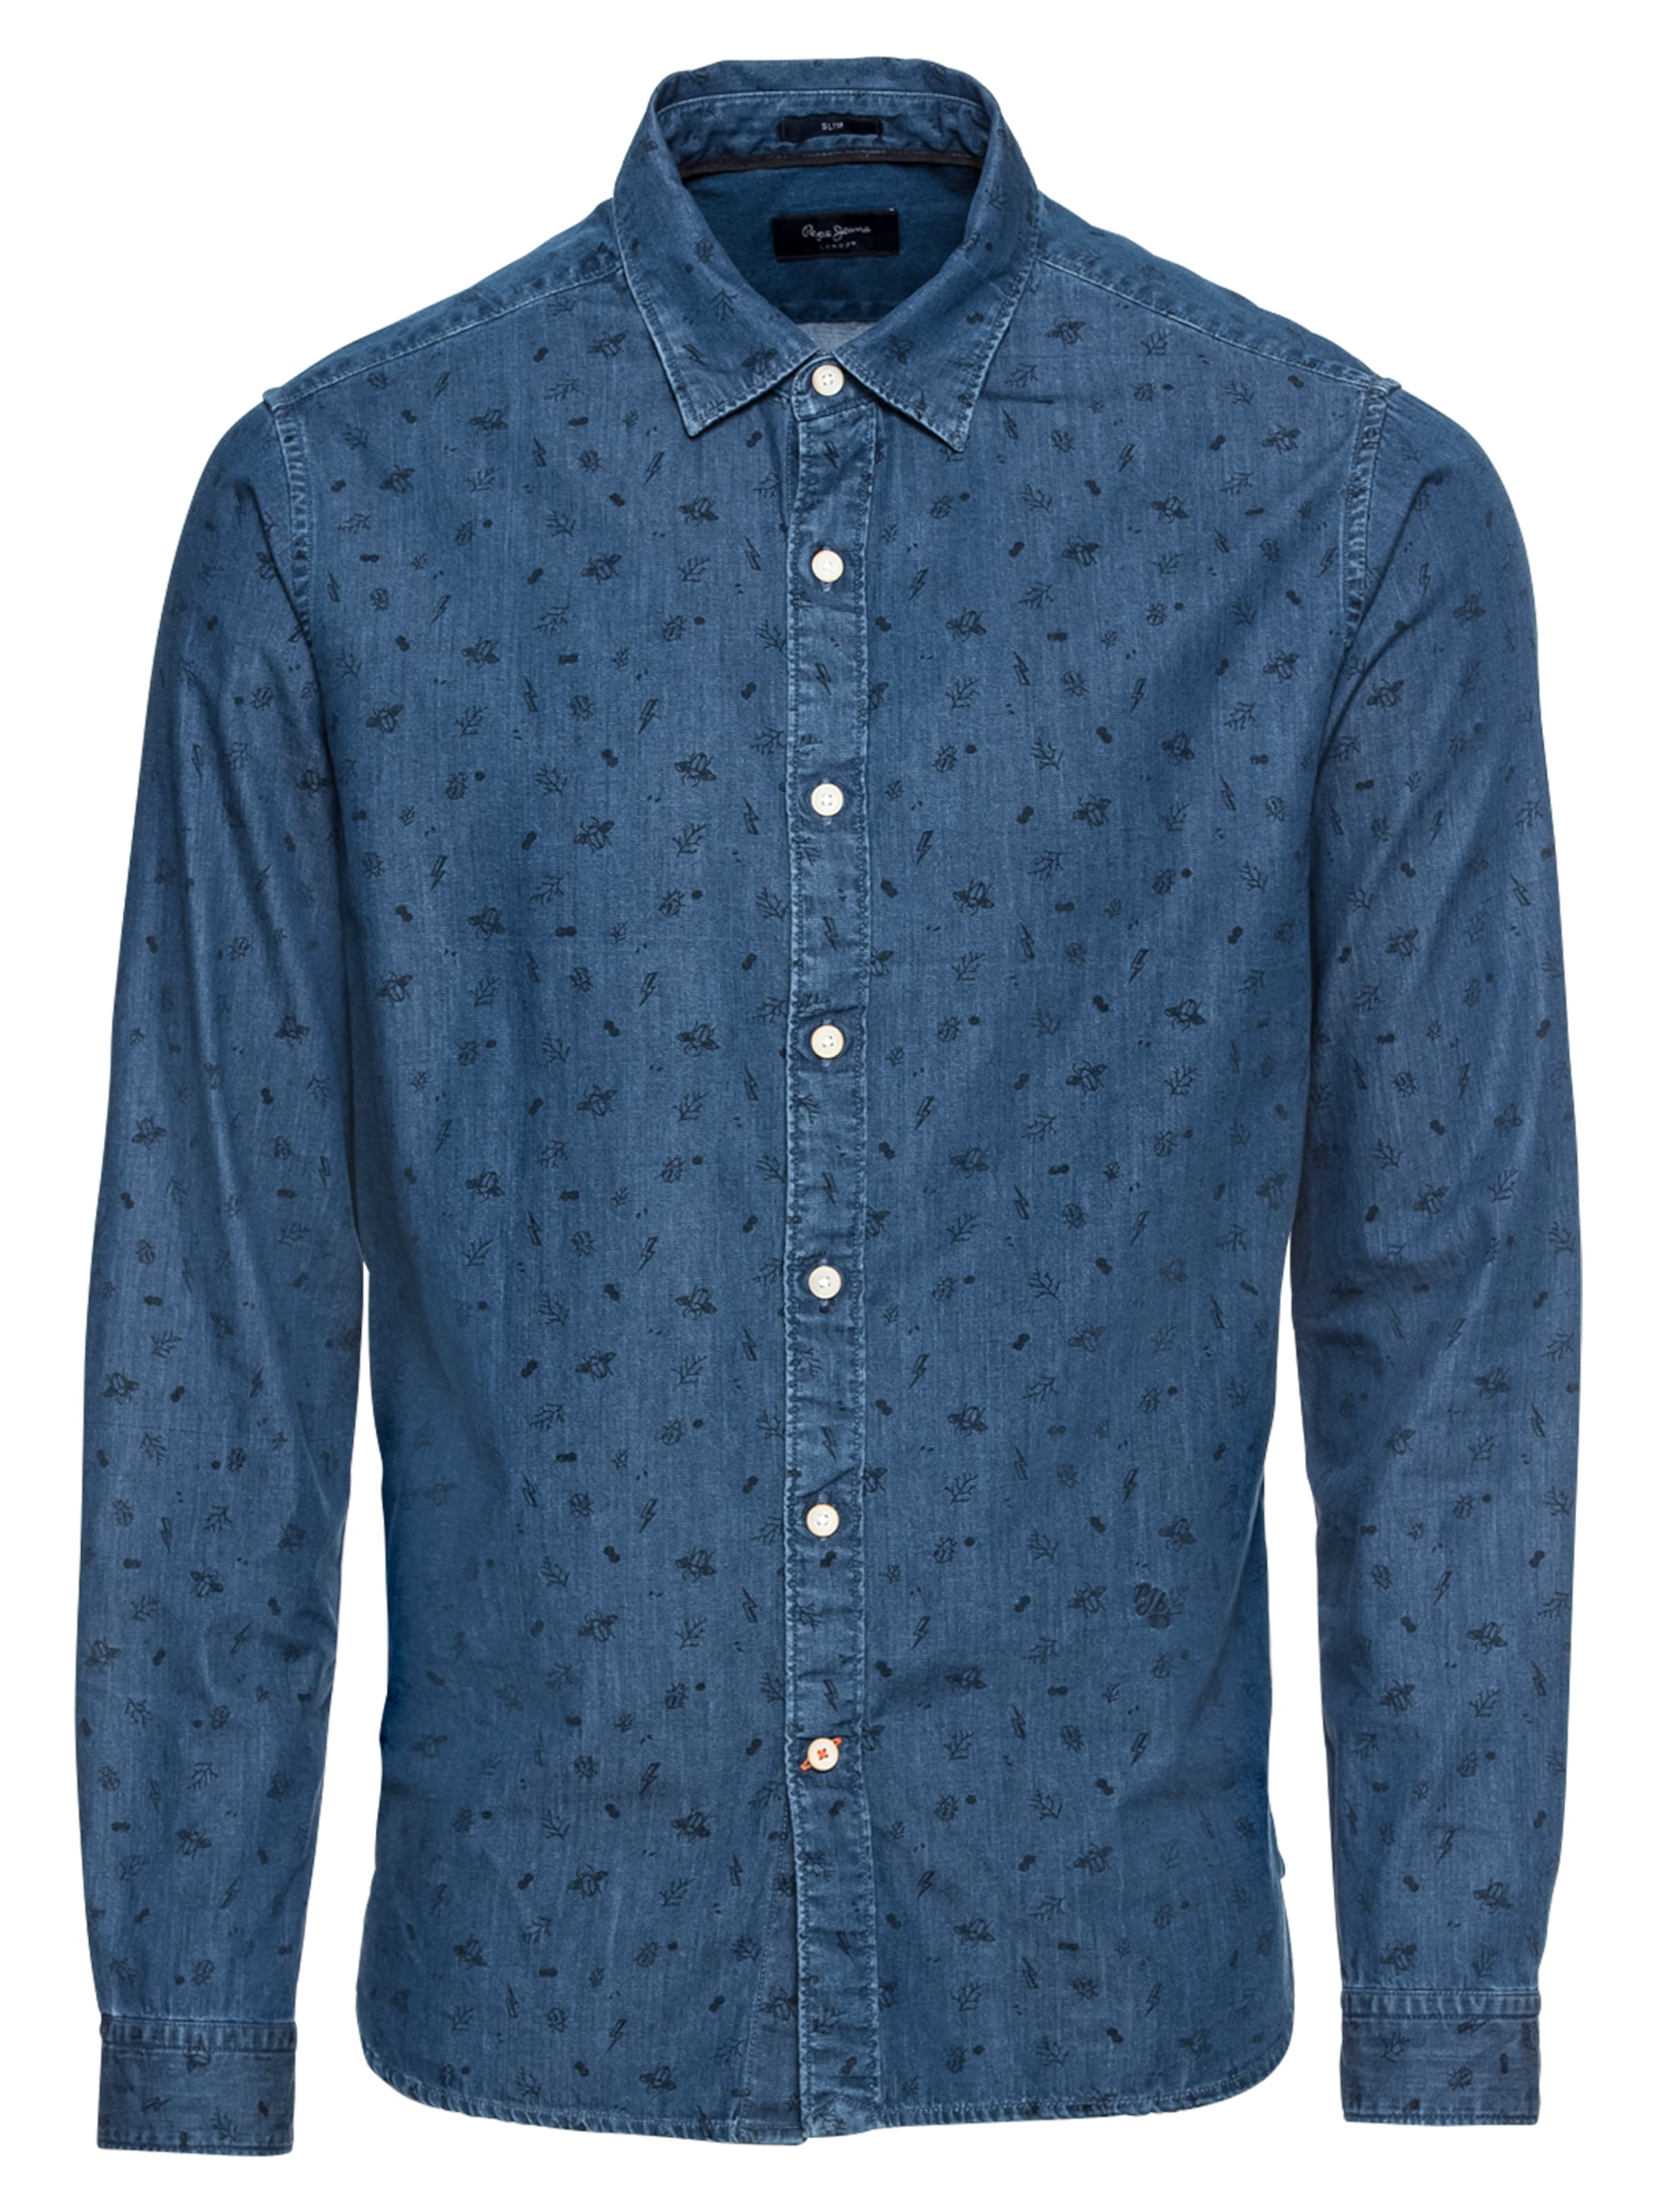 Jeans En 'harold' Chemise Denim Pepe Bleu EH9WIYD2